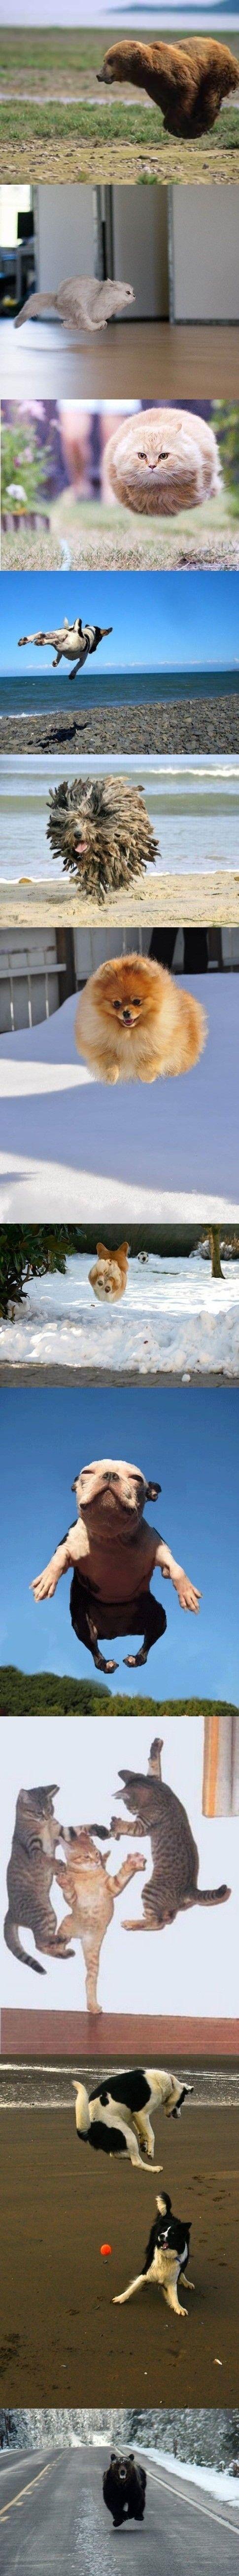 Animals running.